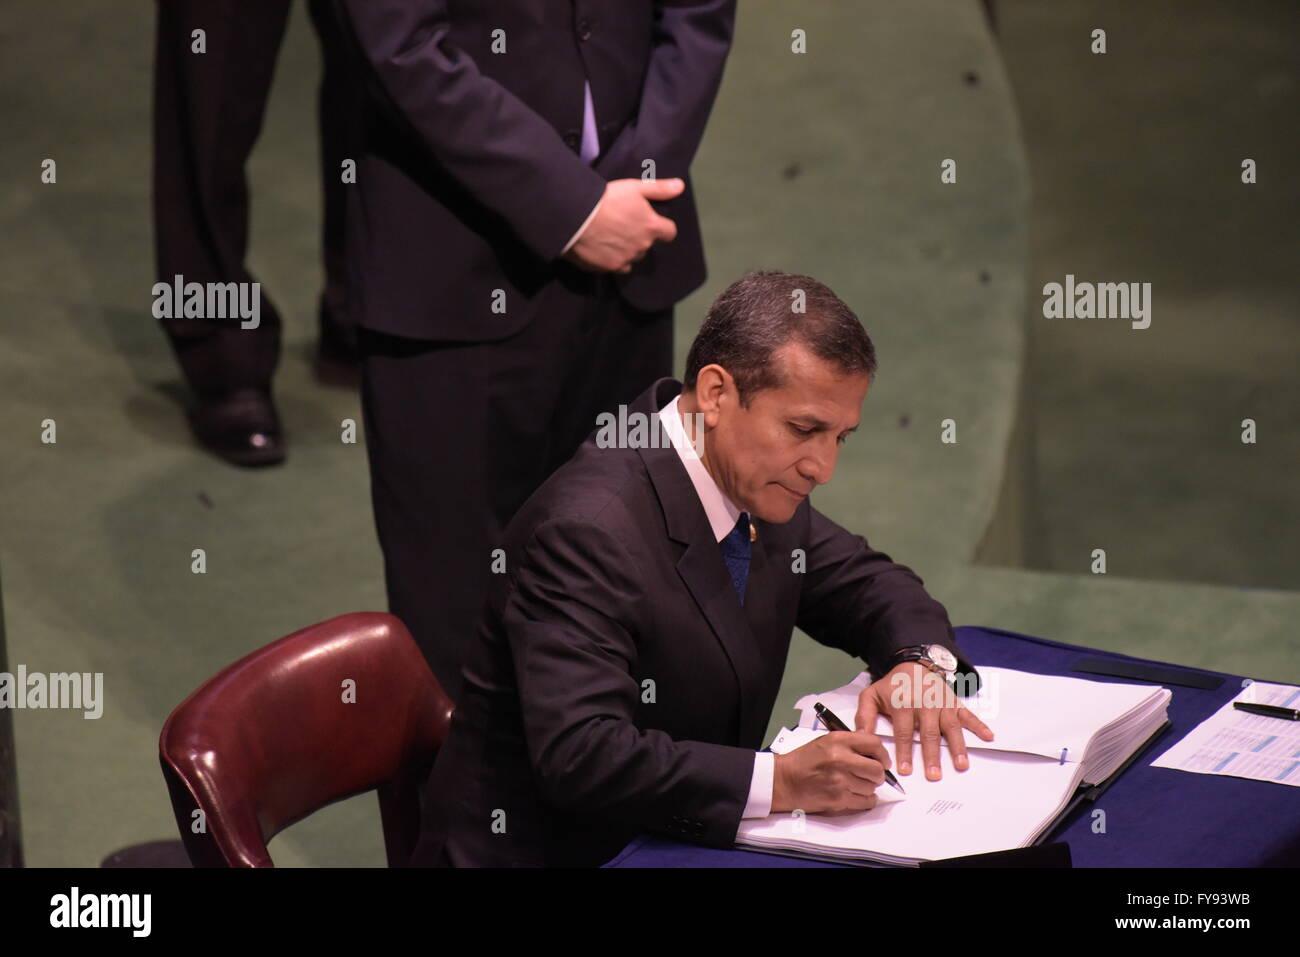 New York City, United States. 22nd Apr, 2016. Peruvian president Ollanta Humala signs the Paris Climate Accord. - Stock Image